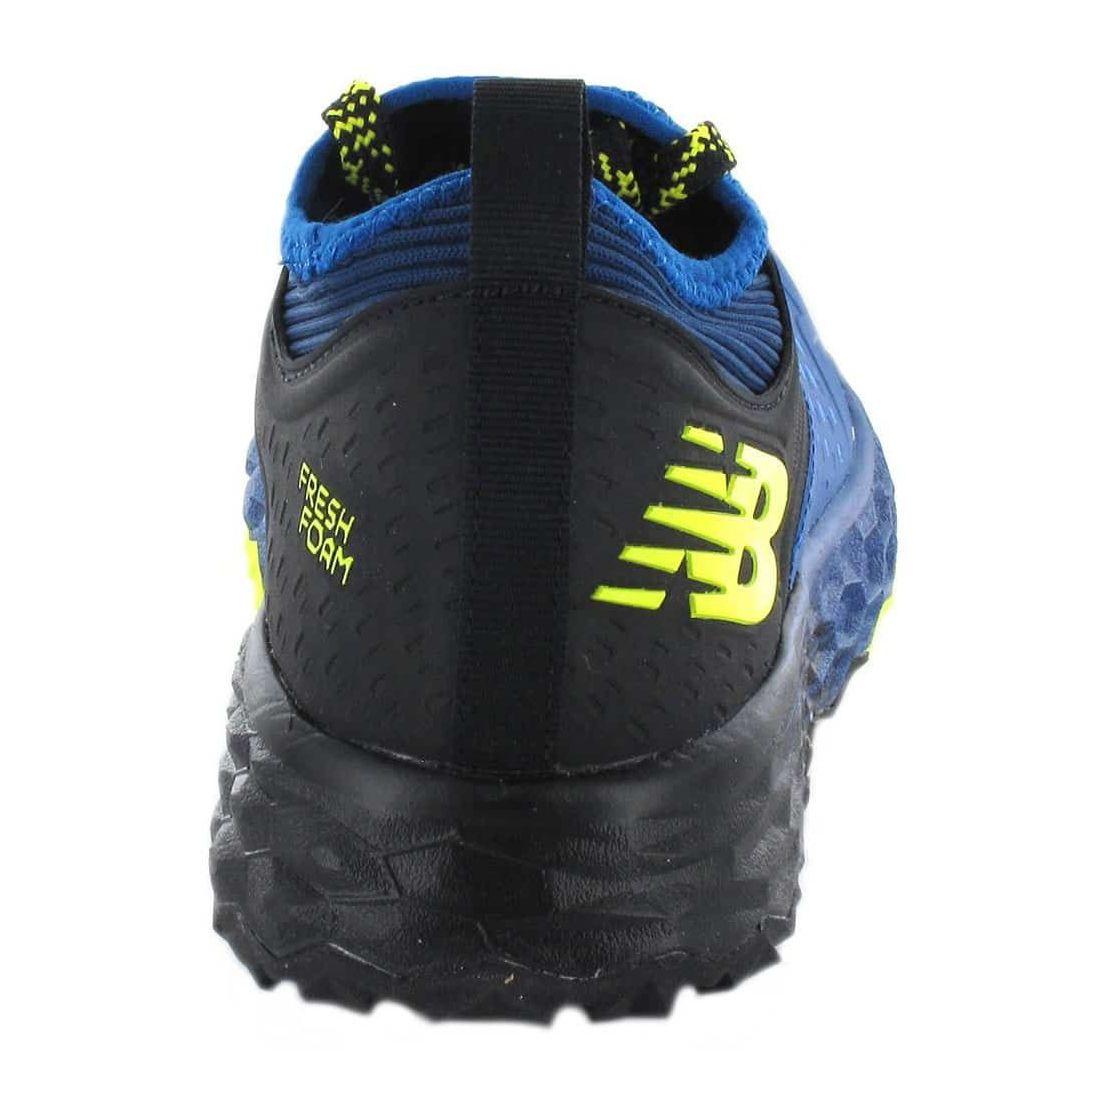 New Balance Fresh Foam Hierro V4 New Balance Zapatillas Trail Running Hombre Zapatillas Trail Running Tallas: 41,5, 42